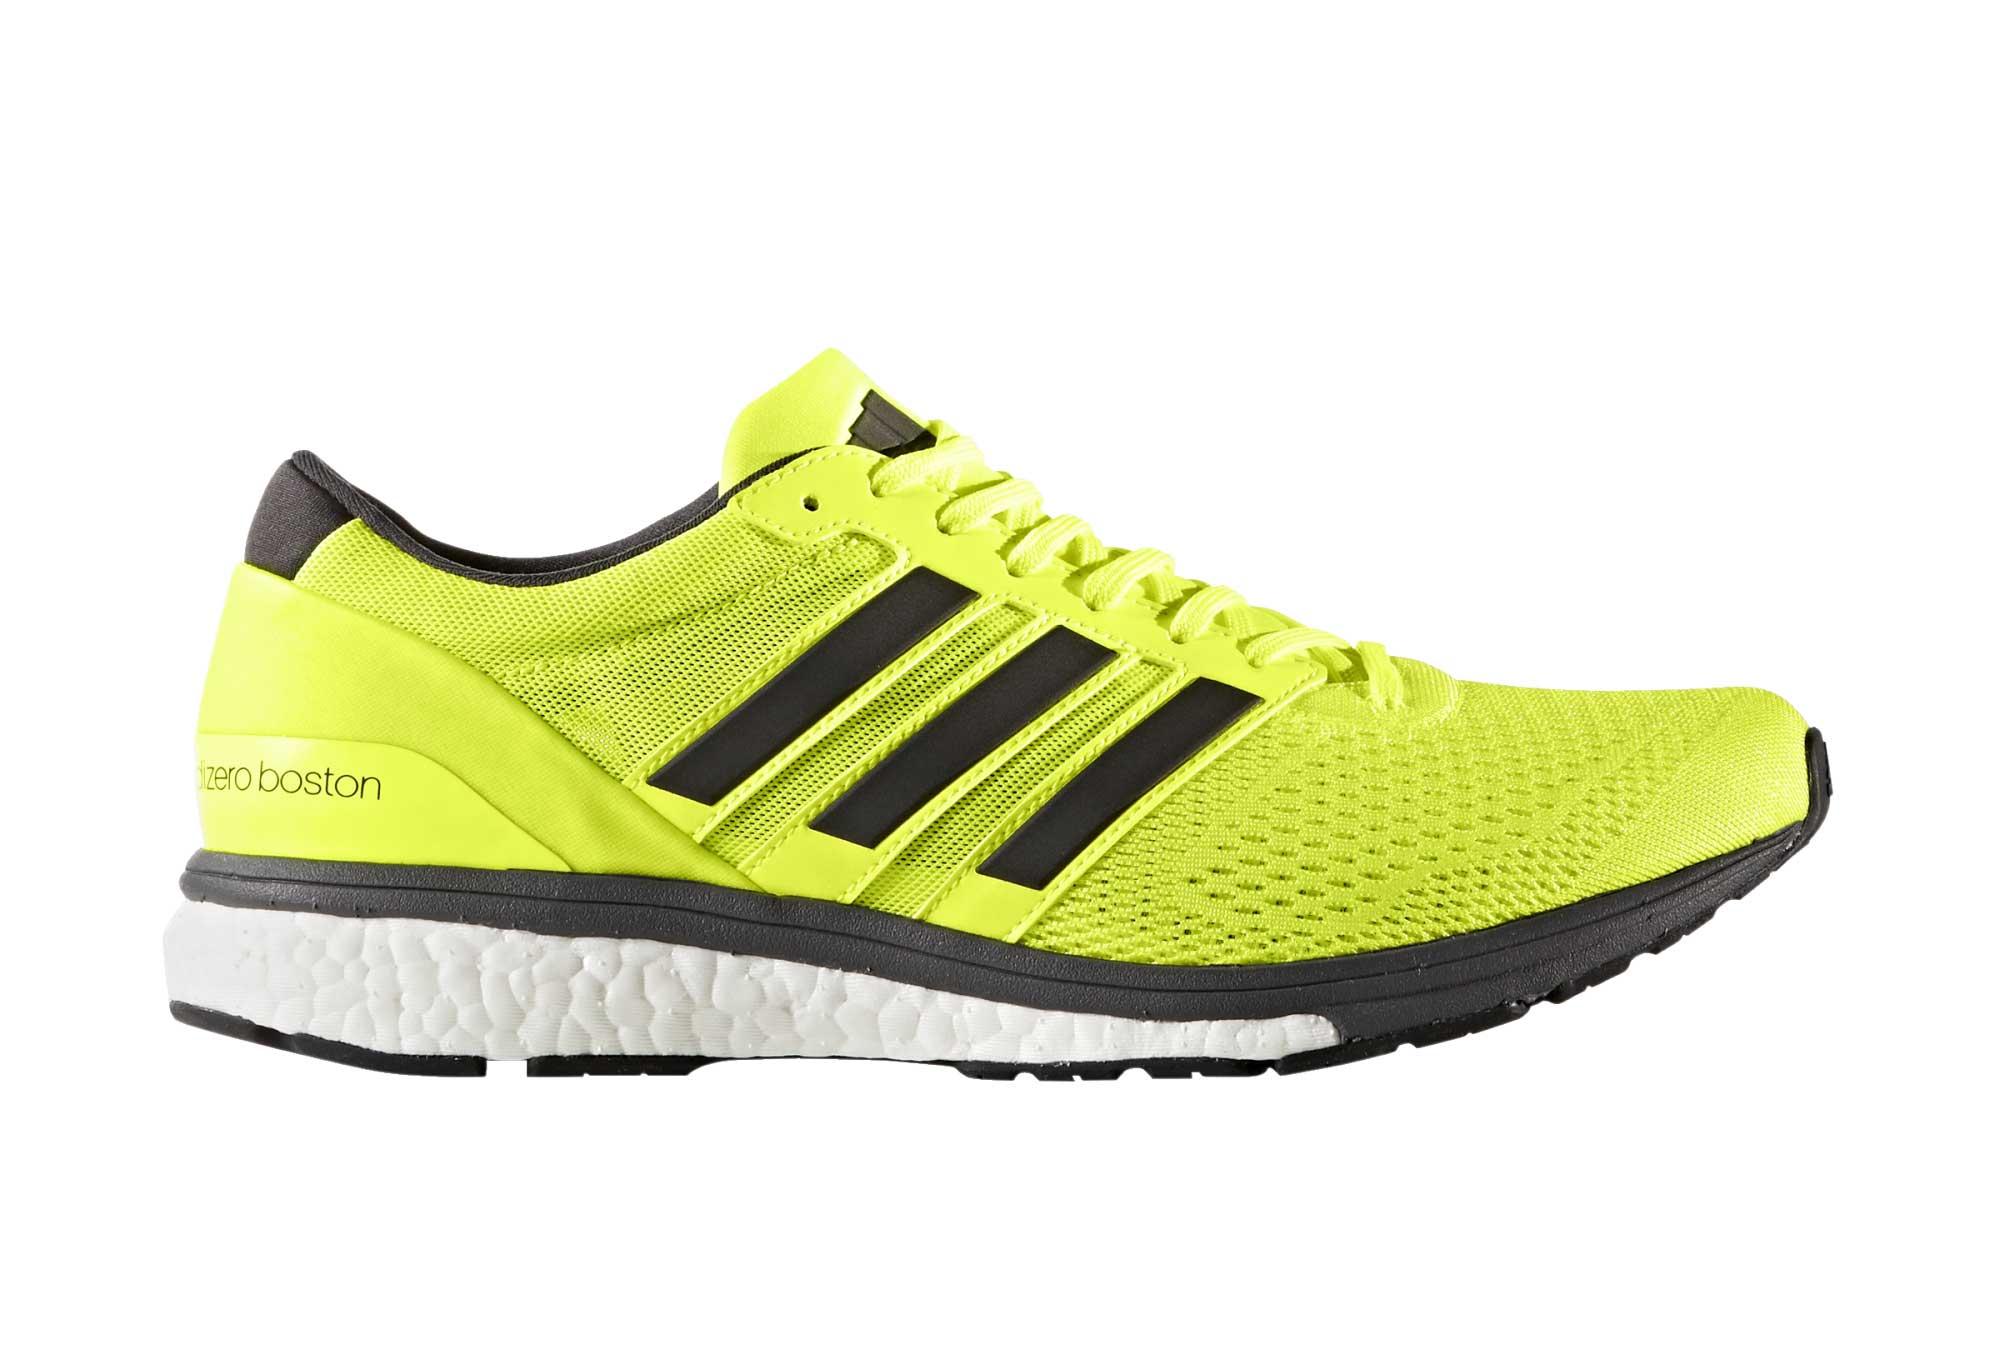 Fluo Running Boston Jaune Adidas Adizero Chaussures De 6 8gz8PW0